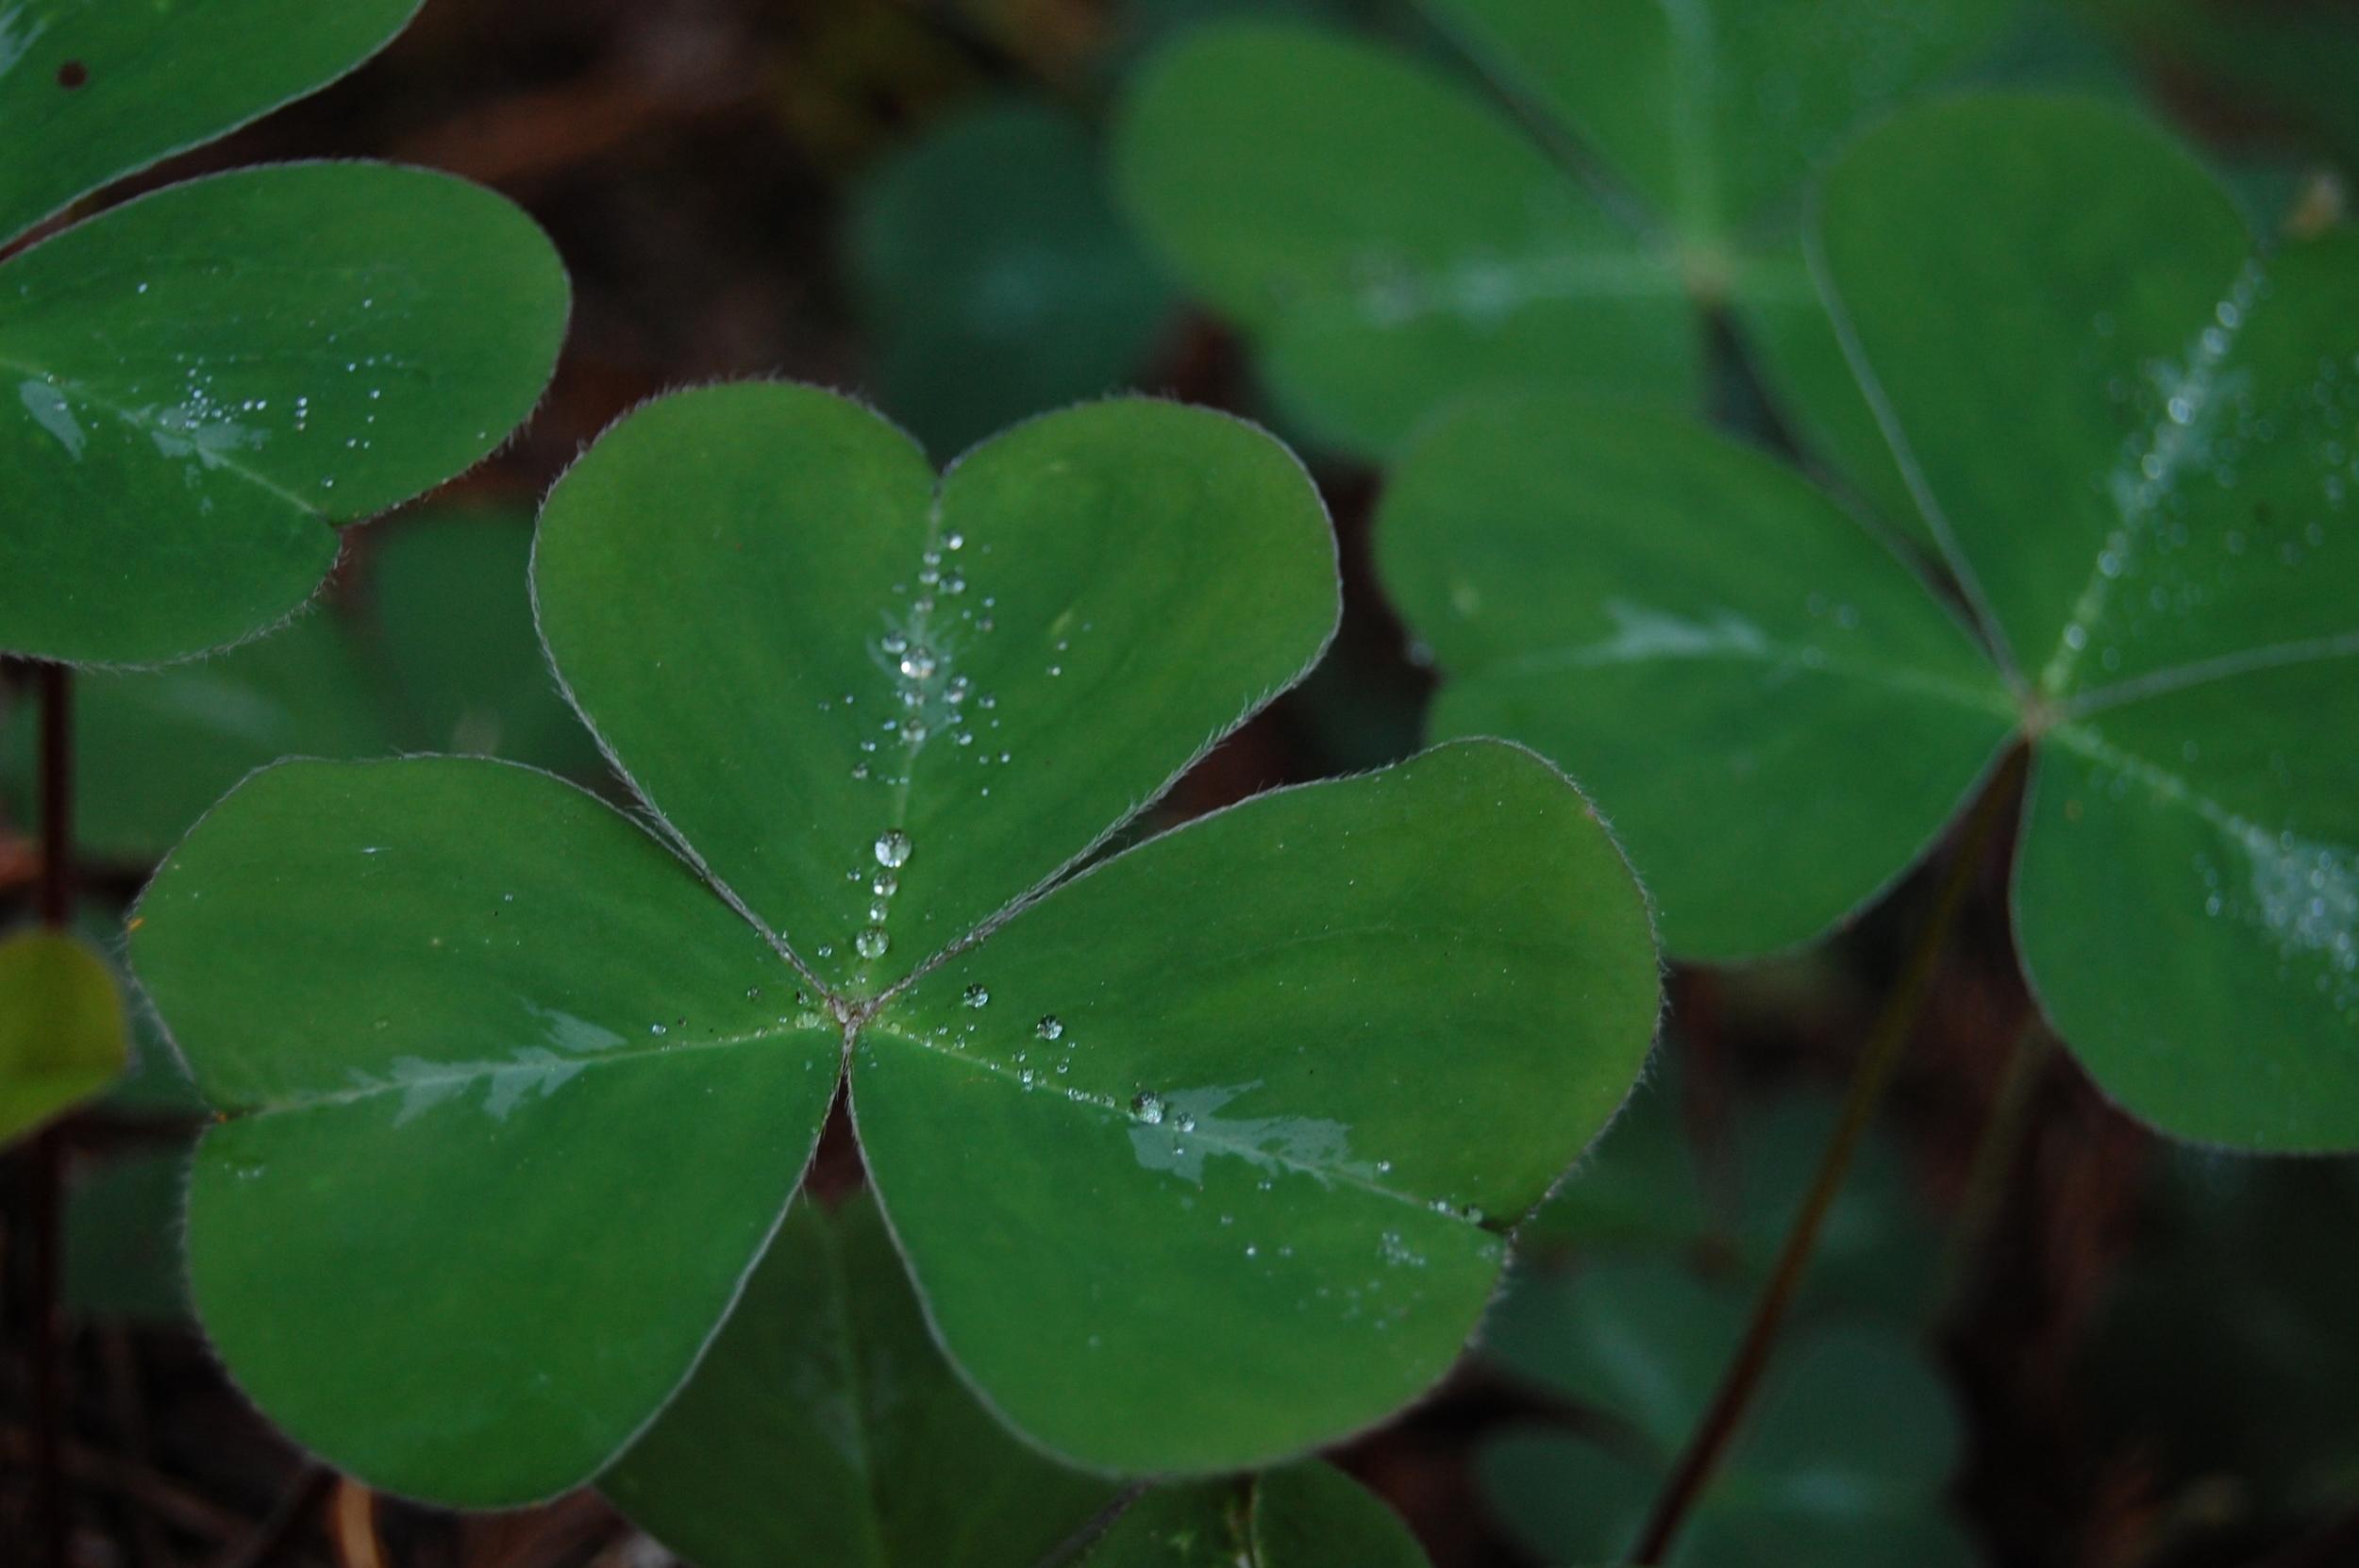 """ Shamrock Leaf "" by  Erik fitzpatrick  IS LICENSED UNDER  CC BY 2.0 ."